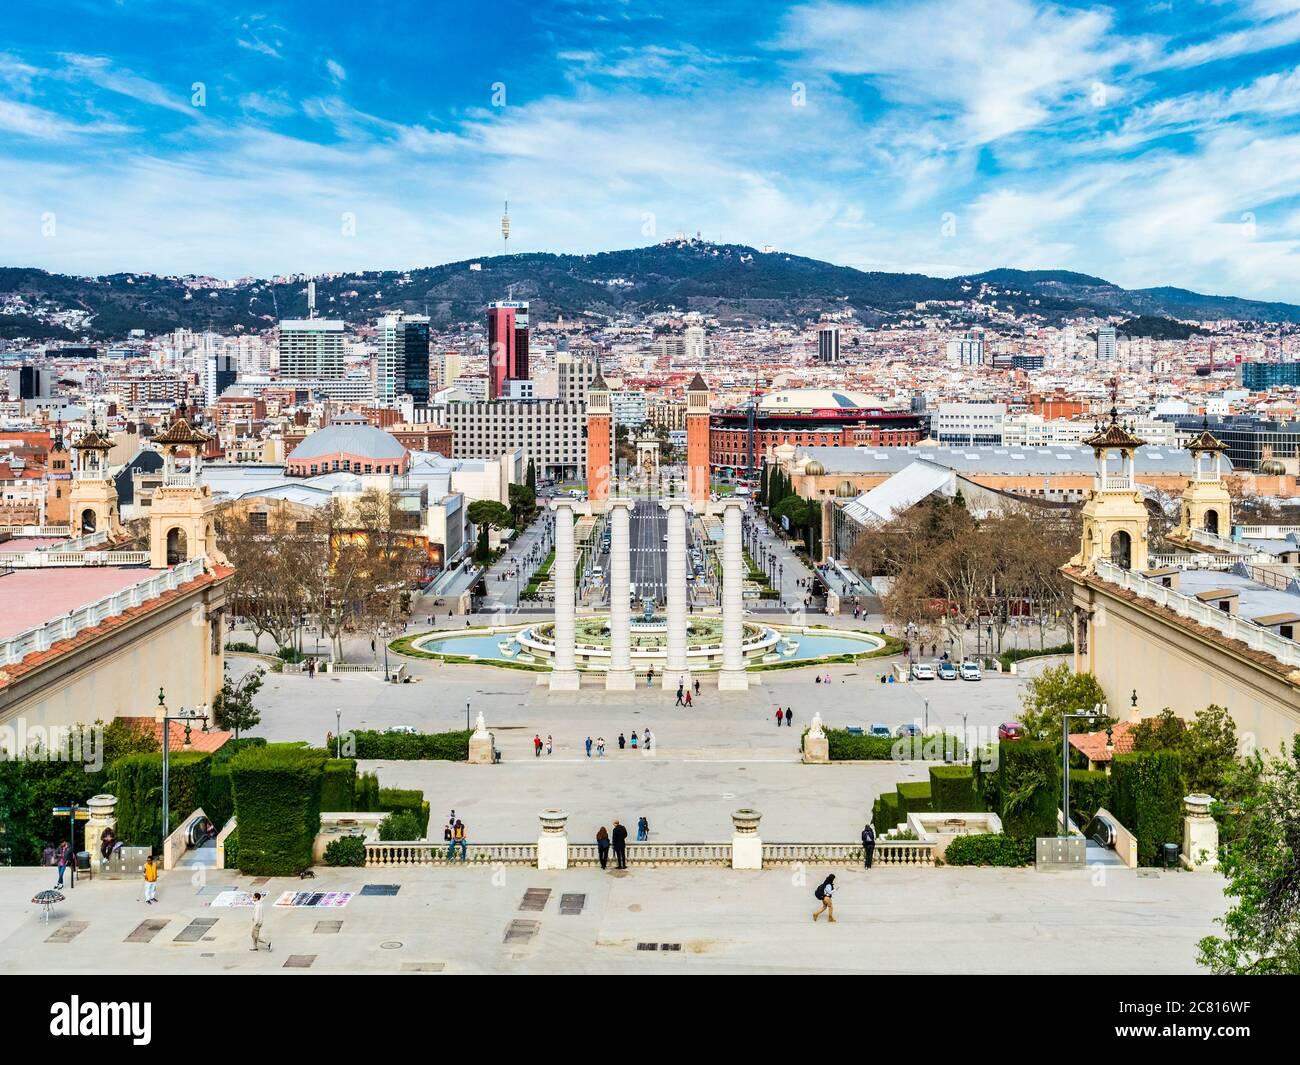 4. März 2020: Barcelona, Spanien - Blick auf Barcelona vom Nationalen Kunstmuseum Kataloniens in Richtung Plaça d'Espanya. Stockfoto